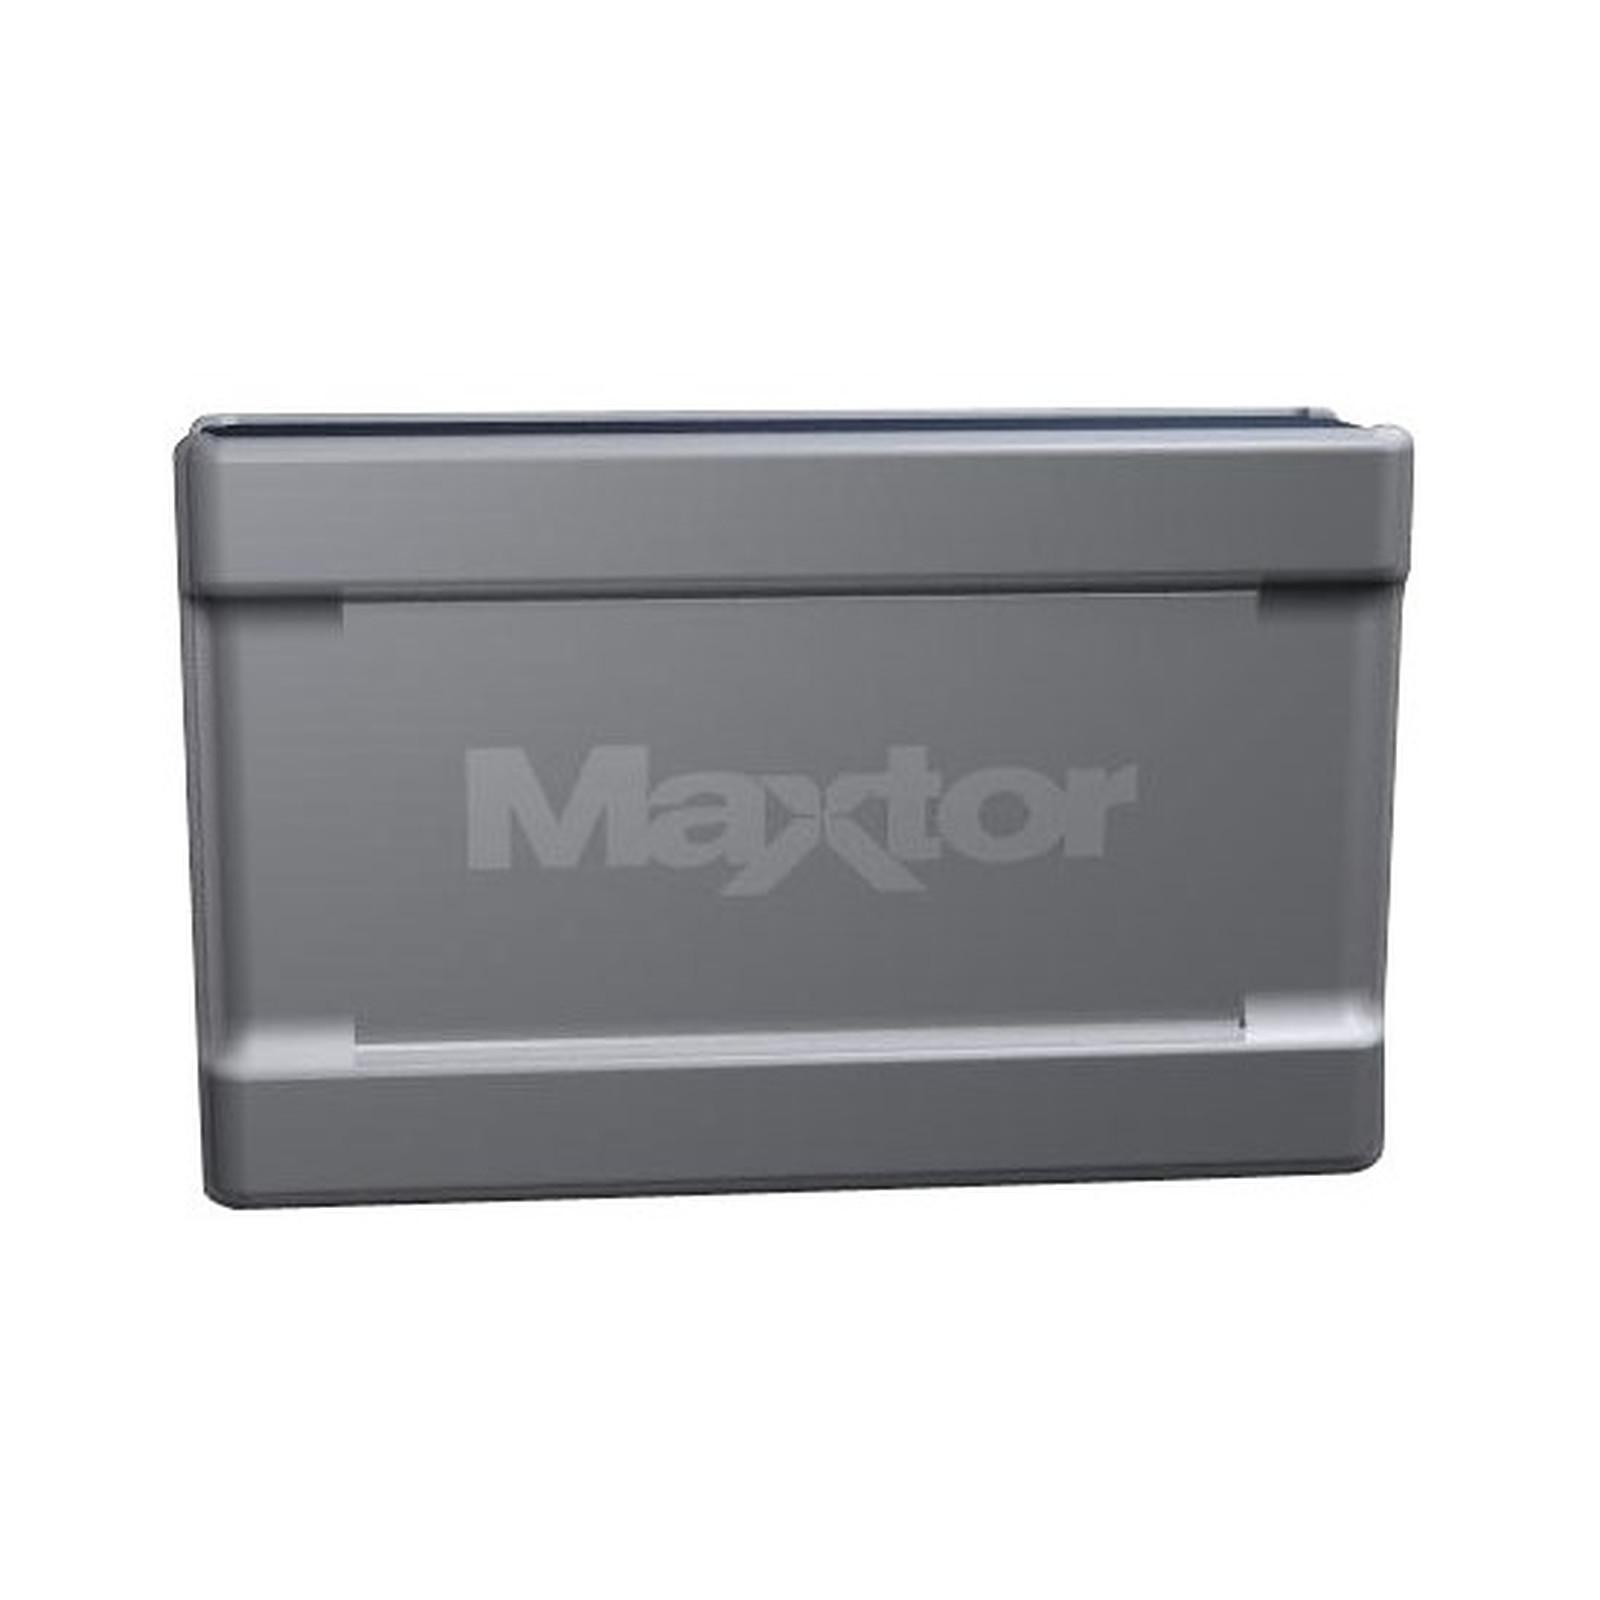 Maxtor Shared Storage Ii 320 Go Maxtor Sur Ldlc Com